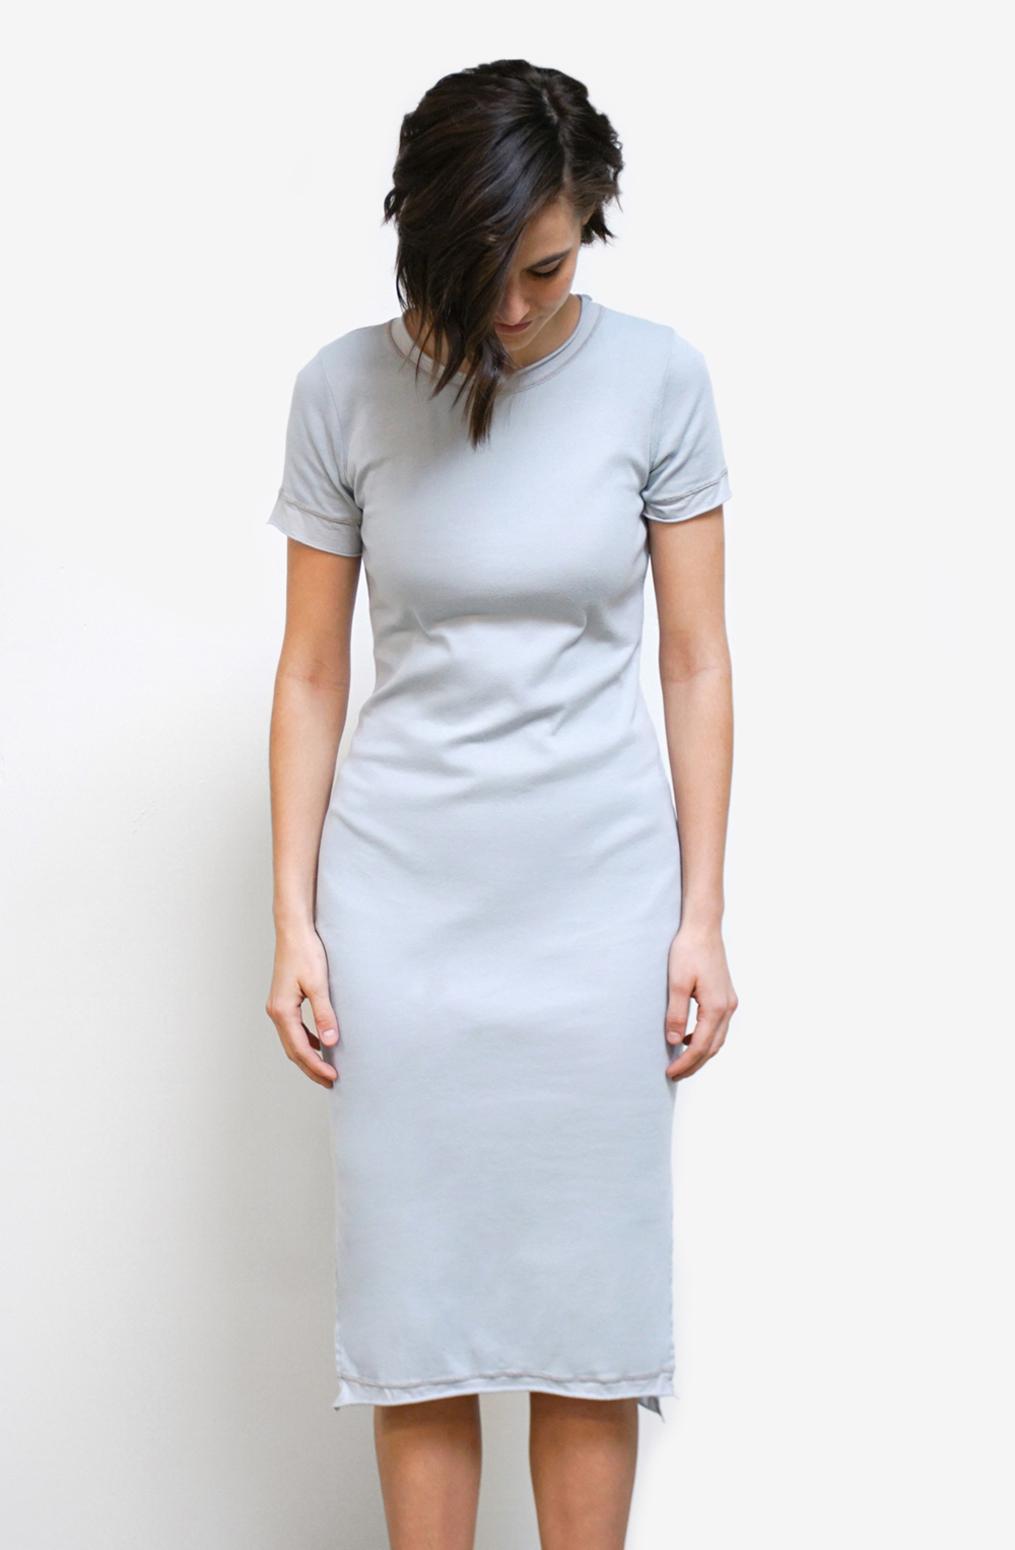 Alabama chanin womens dress cotton crew neck 1